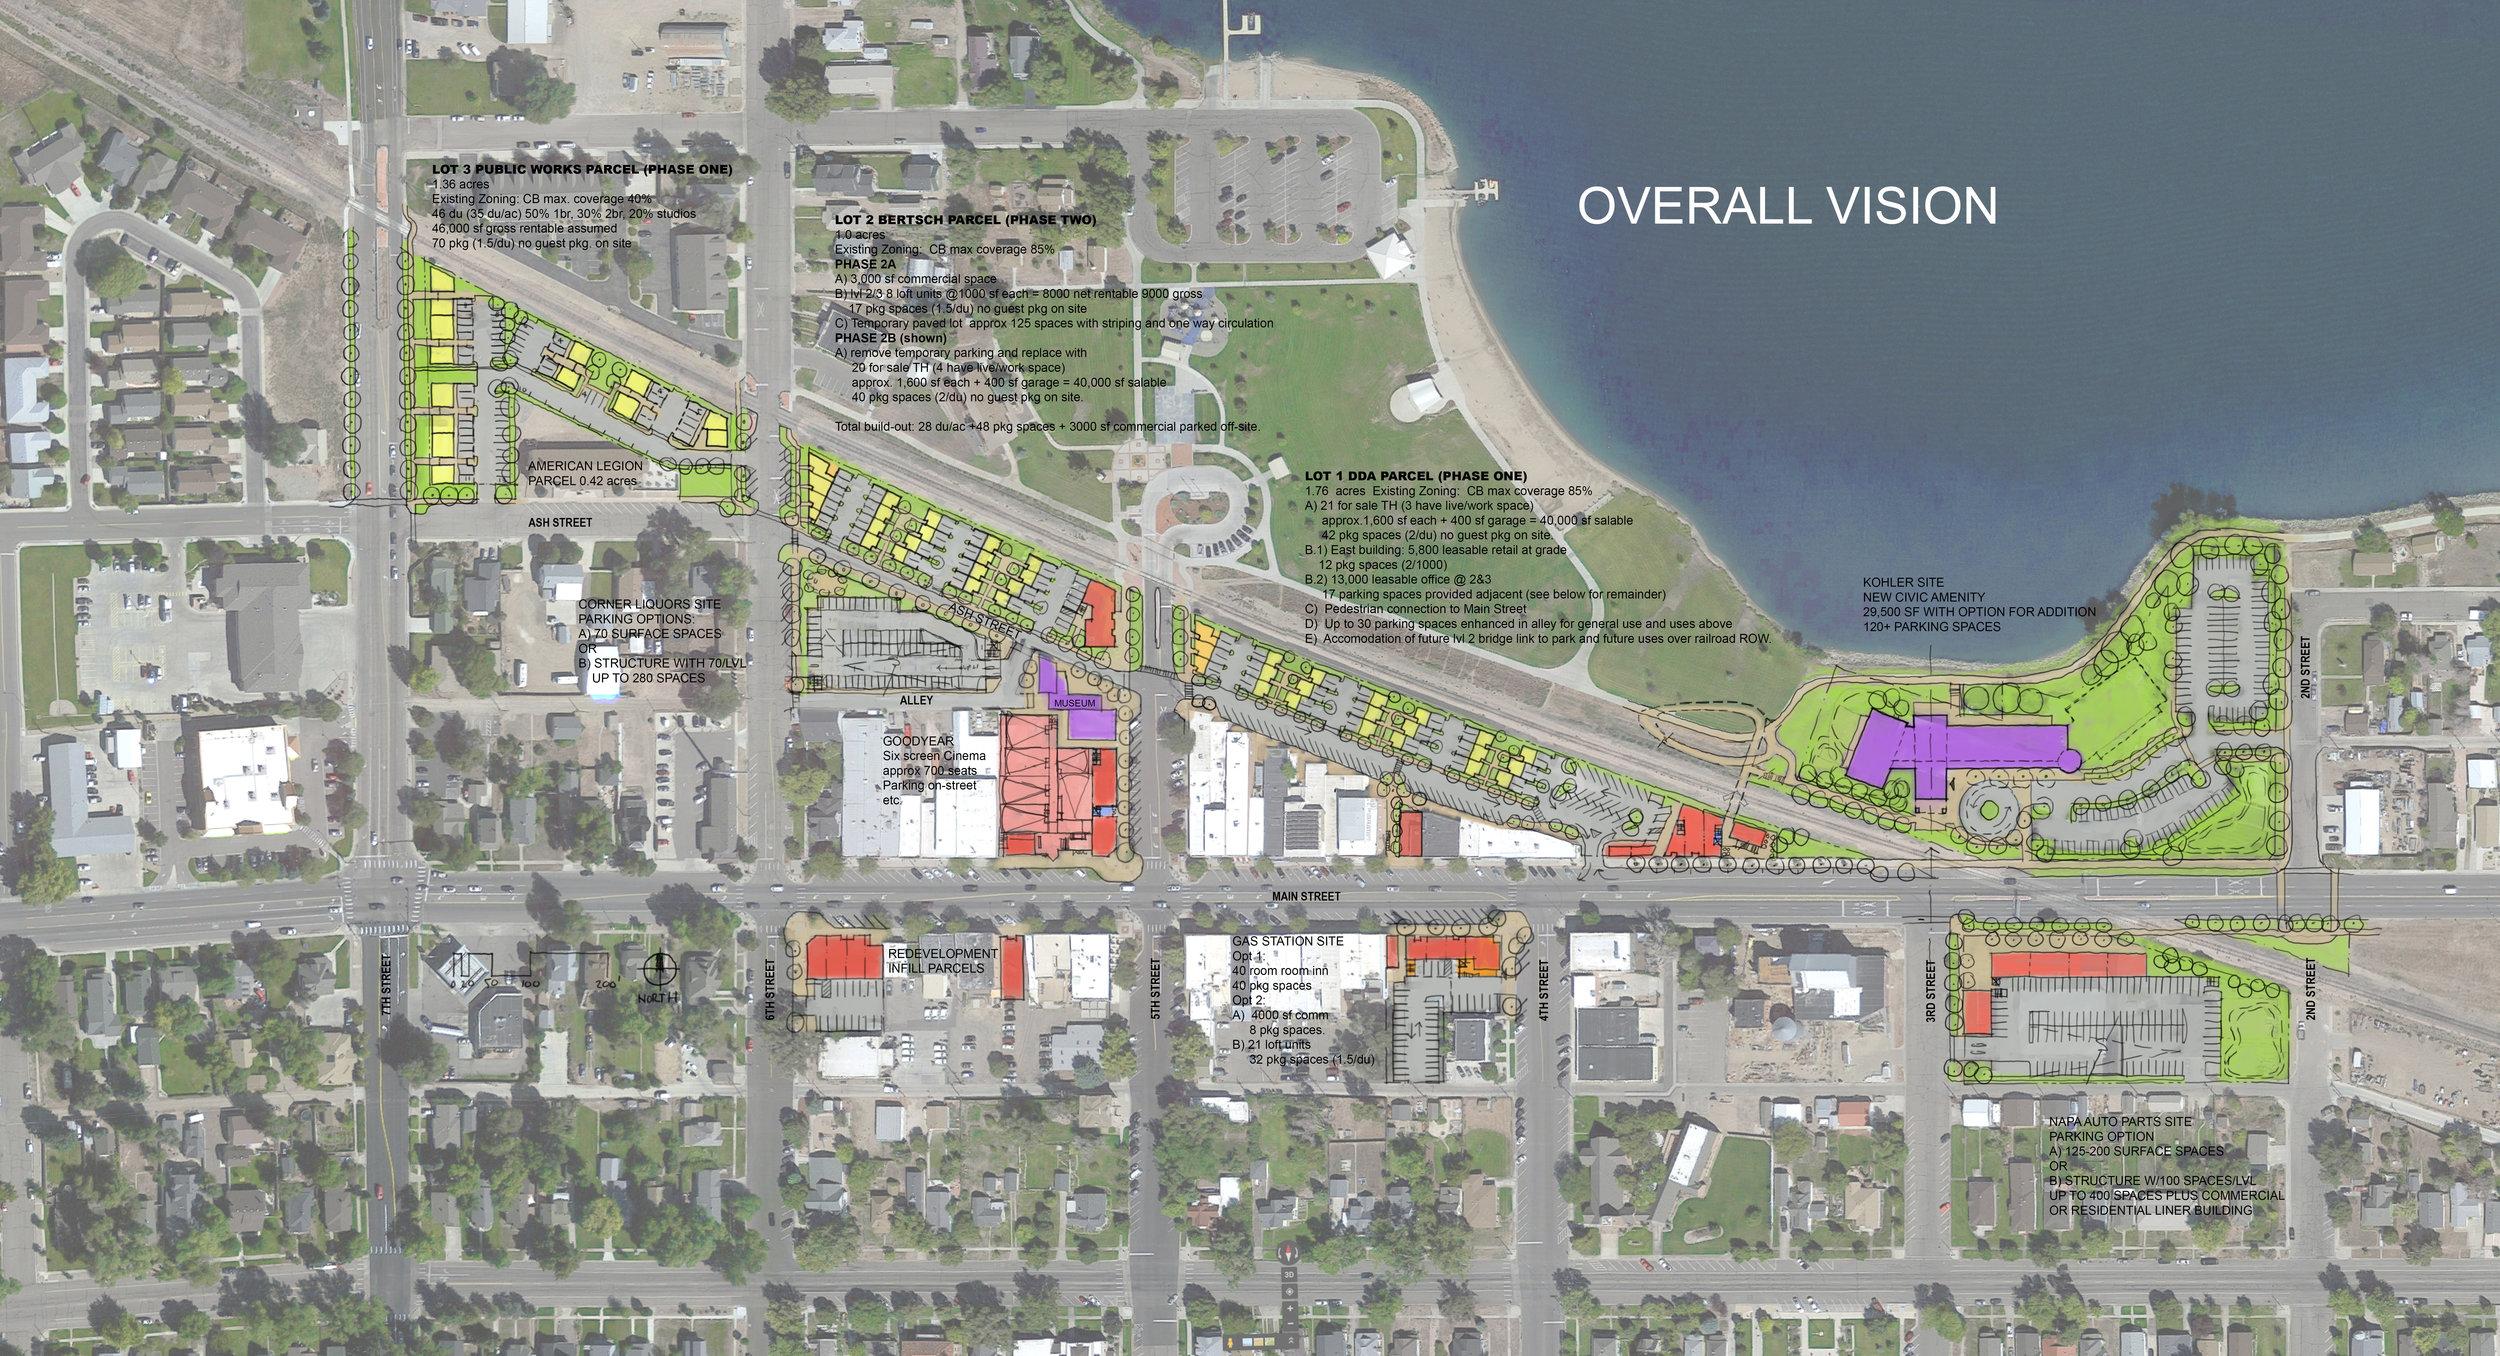 180523 Windsor Overall Site Plan.jpg